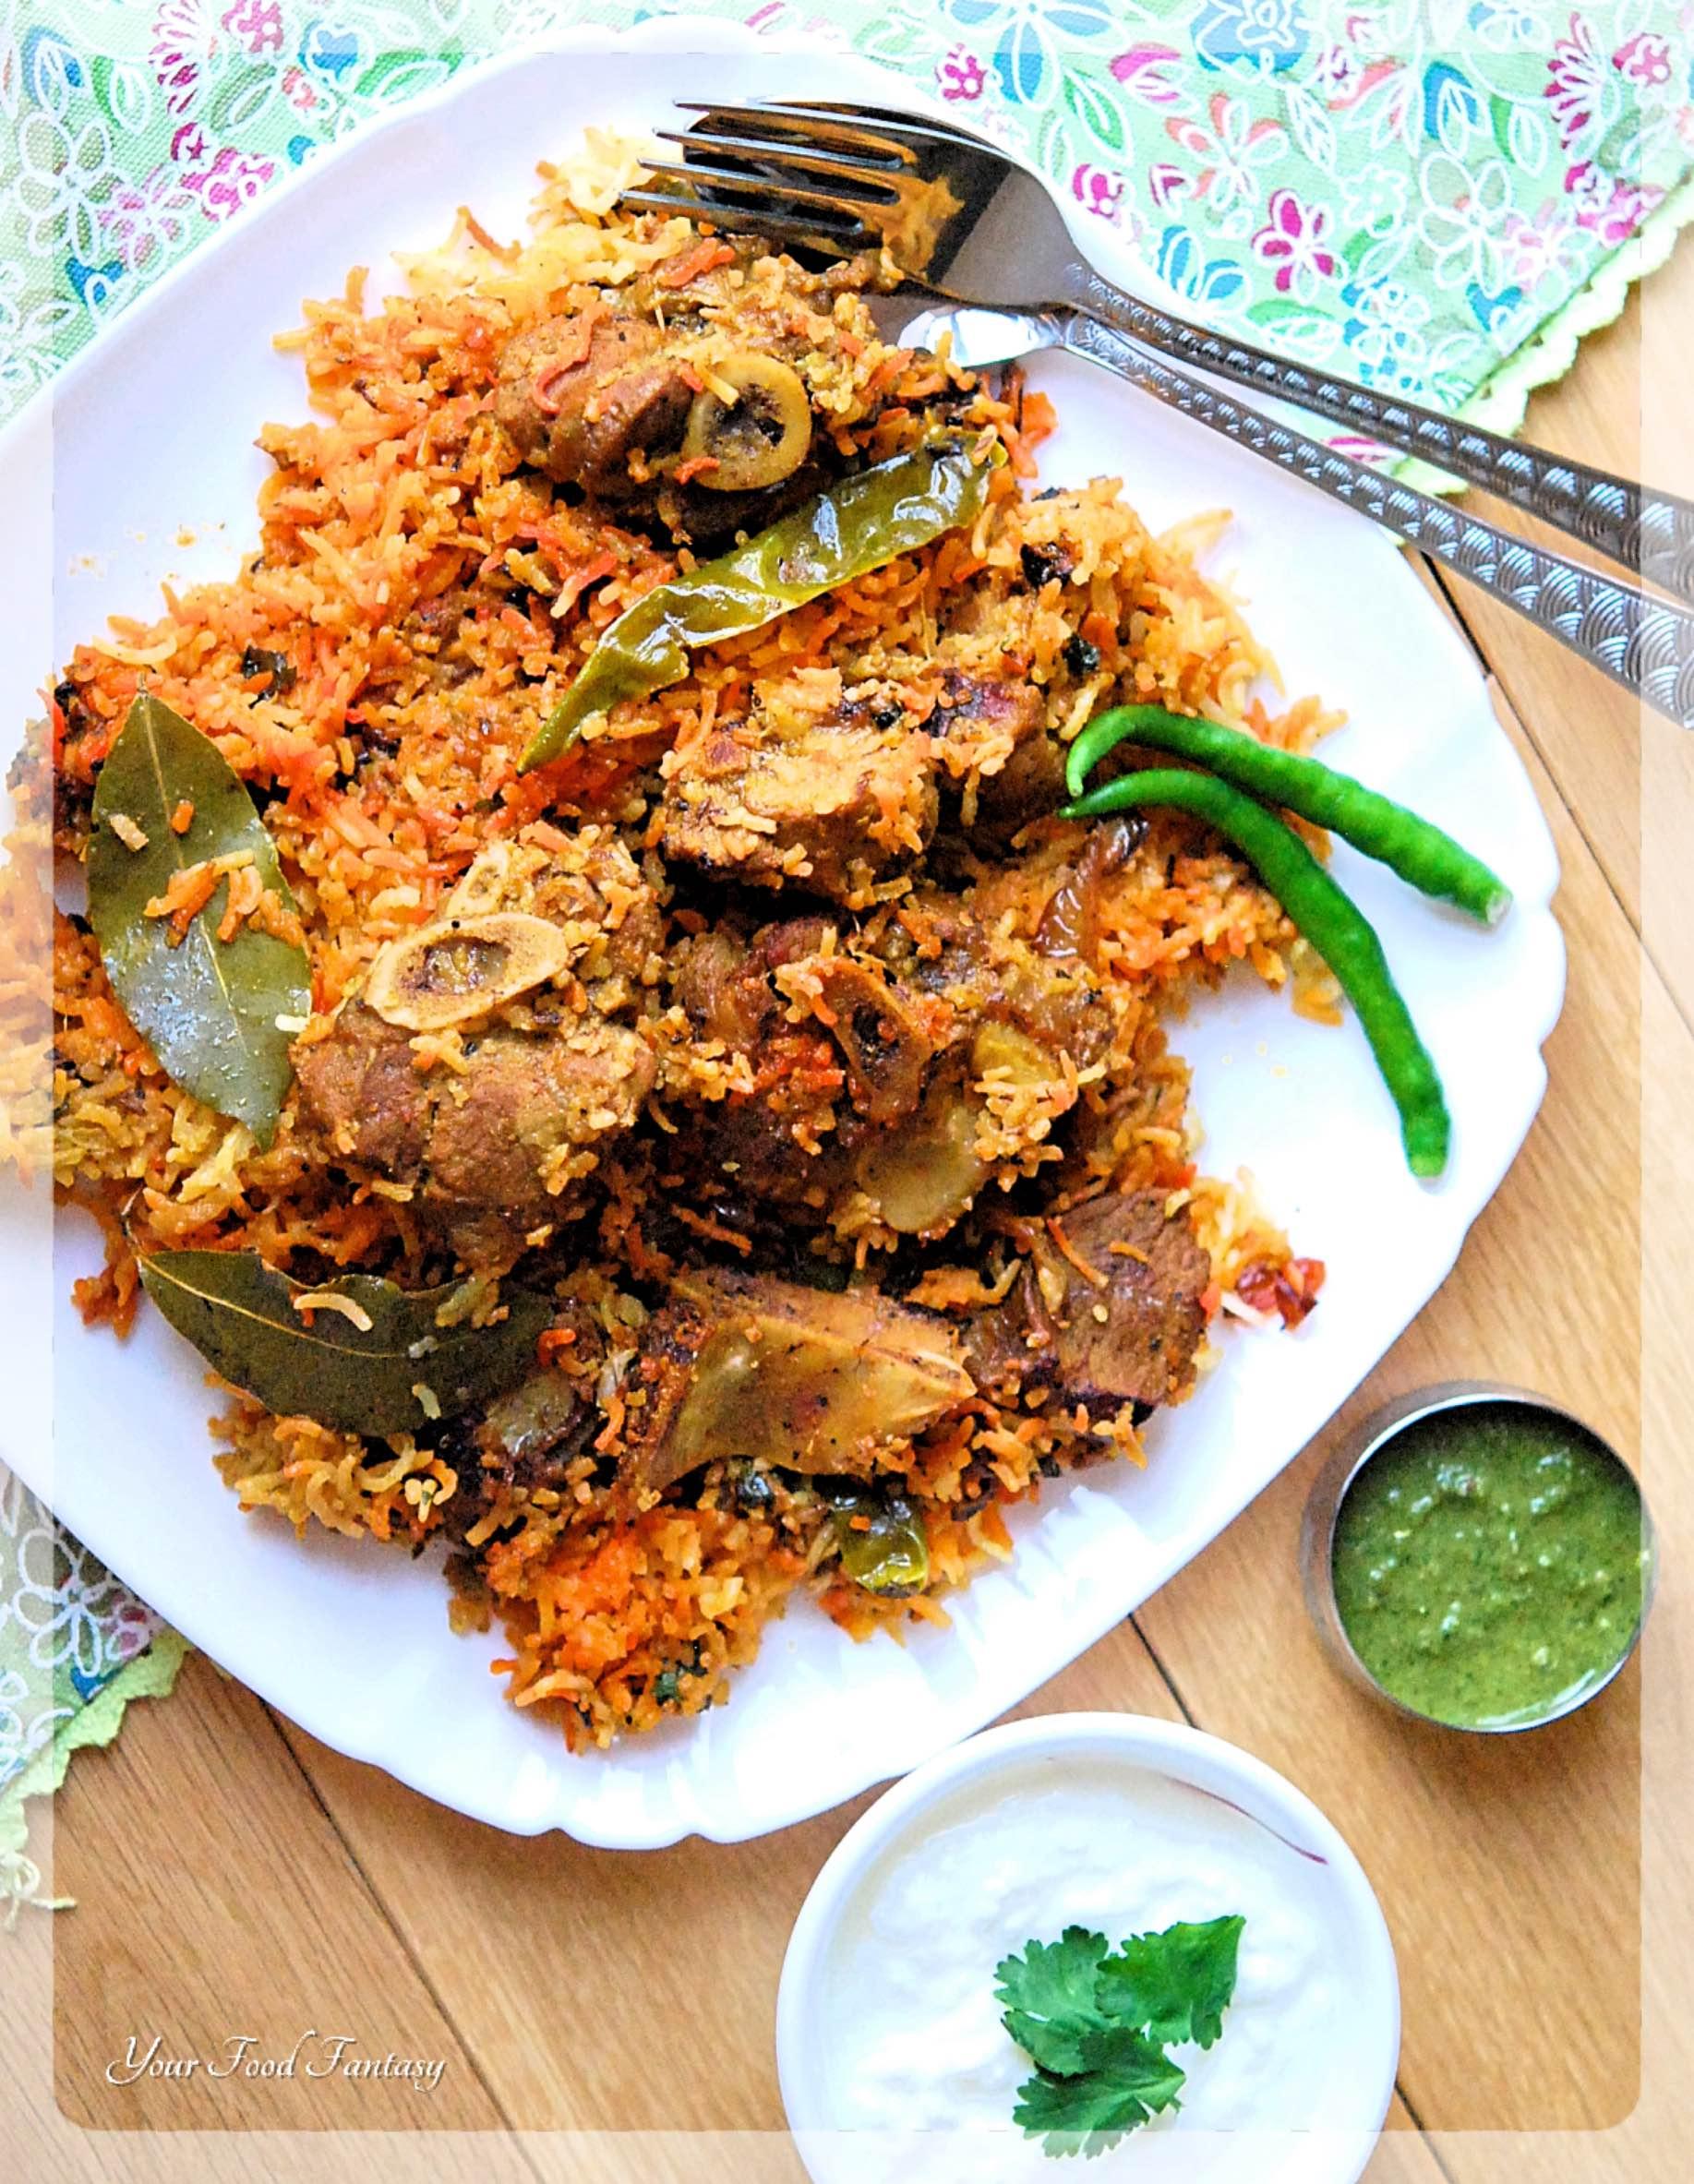 Authentic Mutton Biryani Recipe | Your Food Fantasy